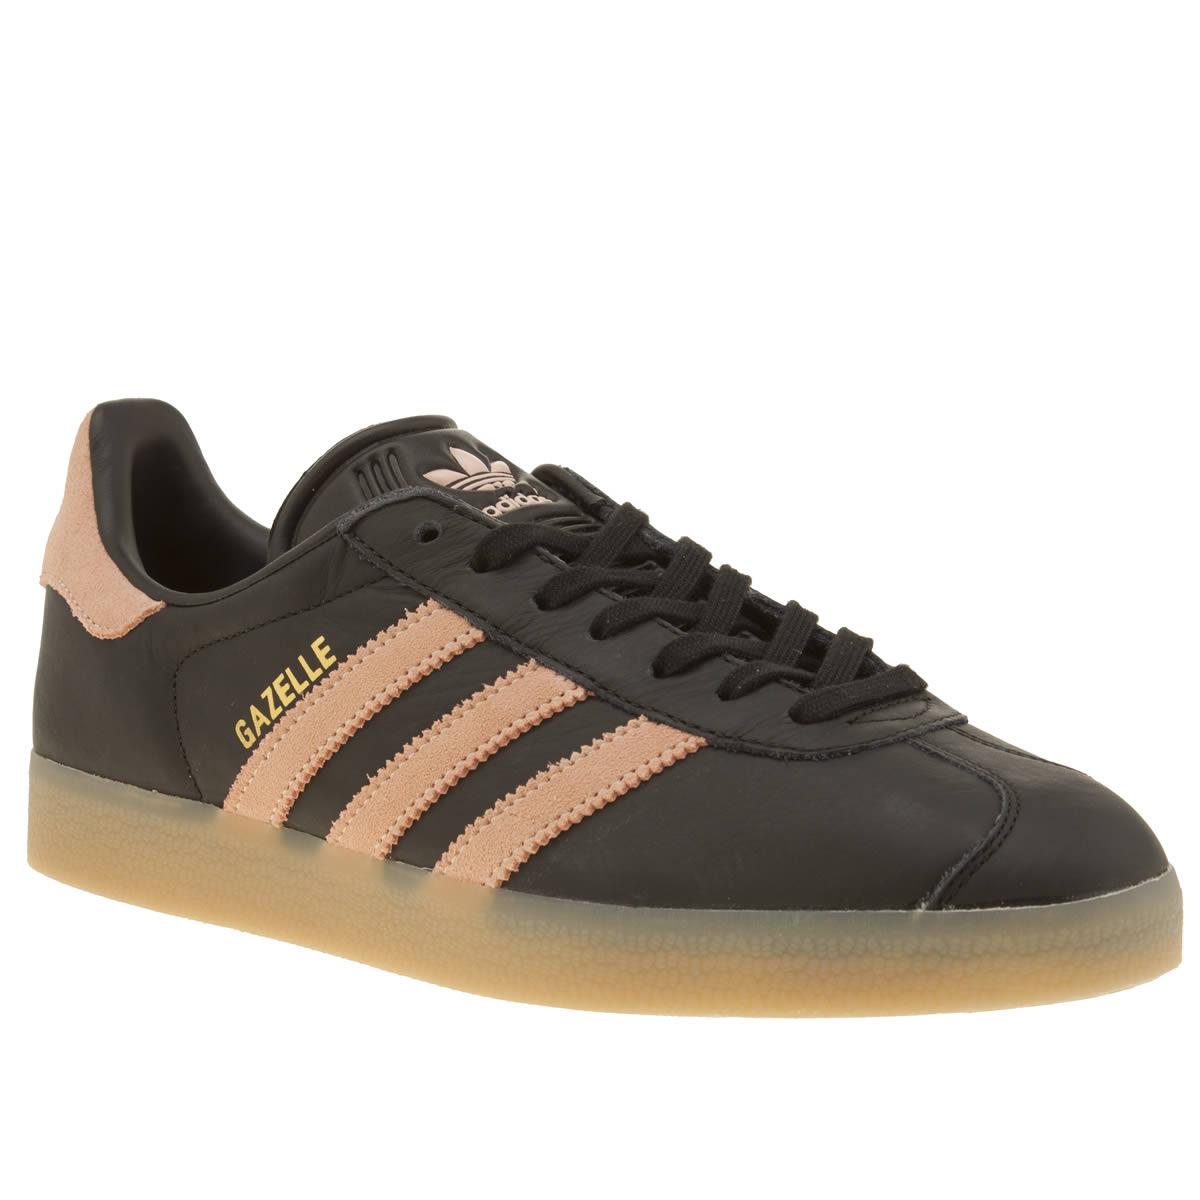 Adidas Gazelle Black Pink